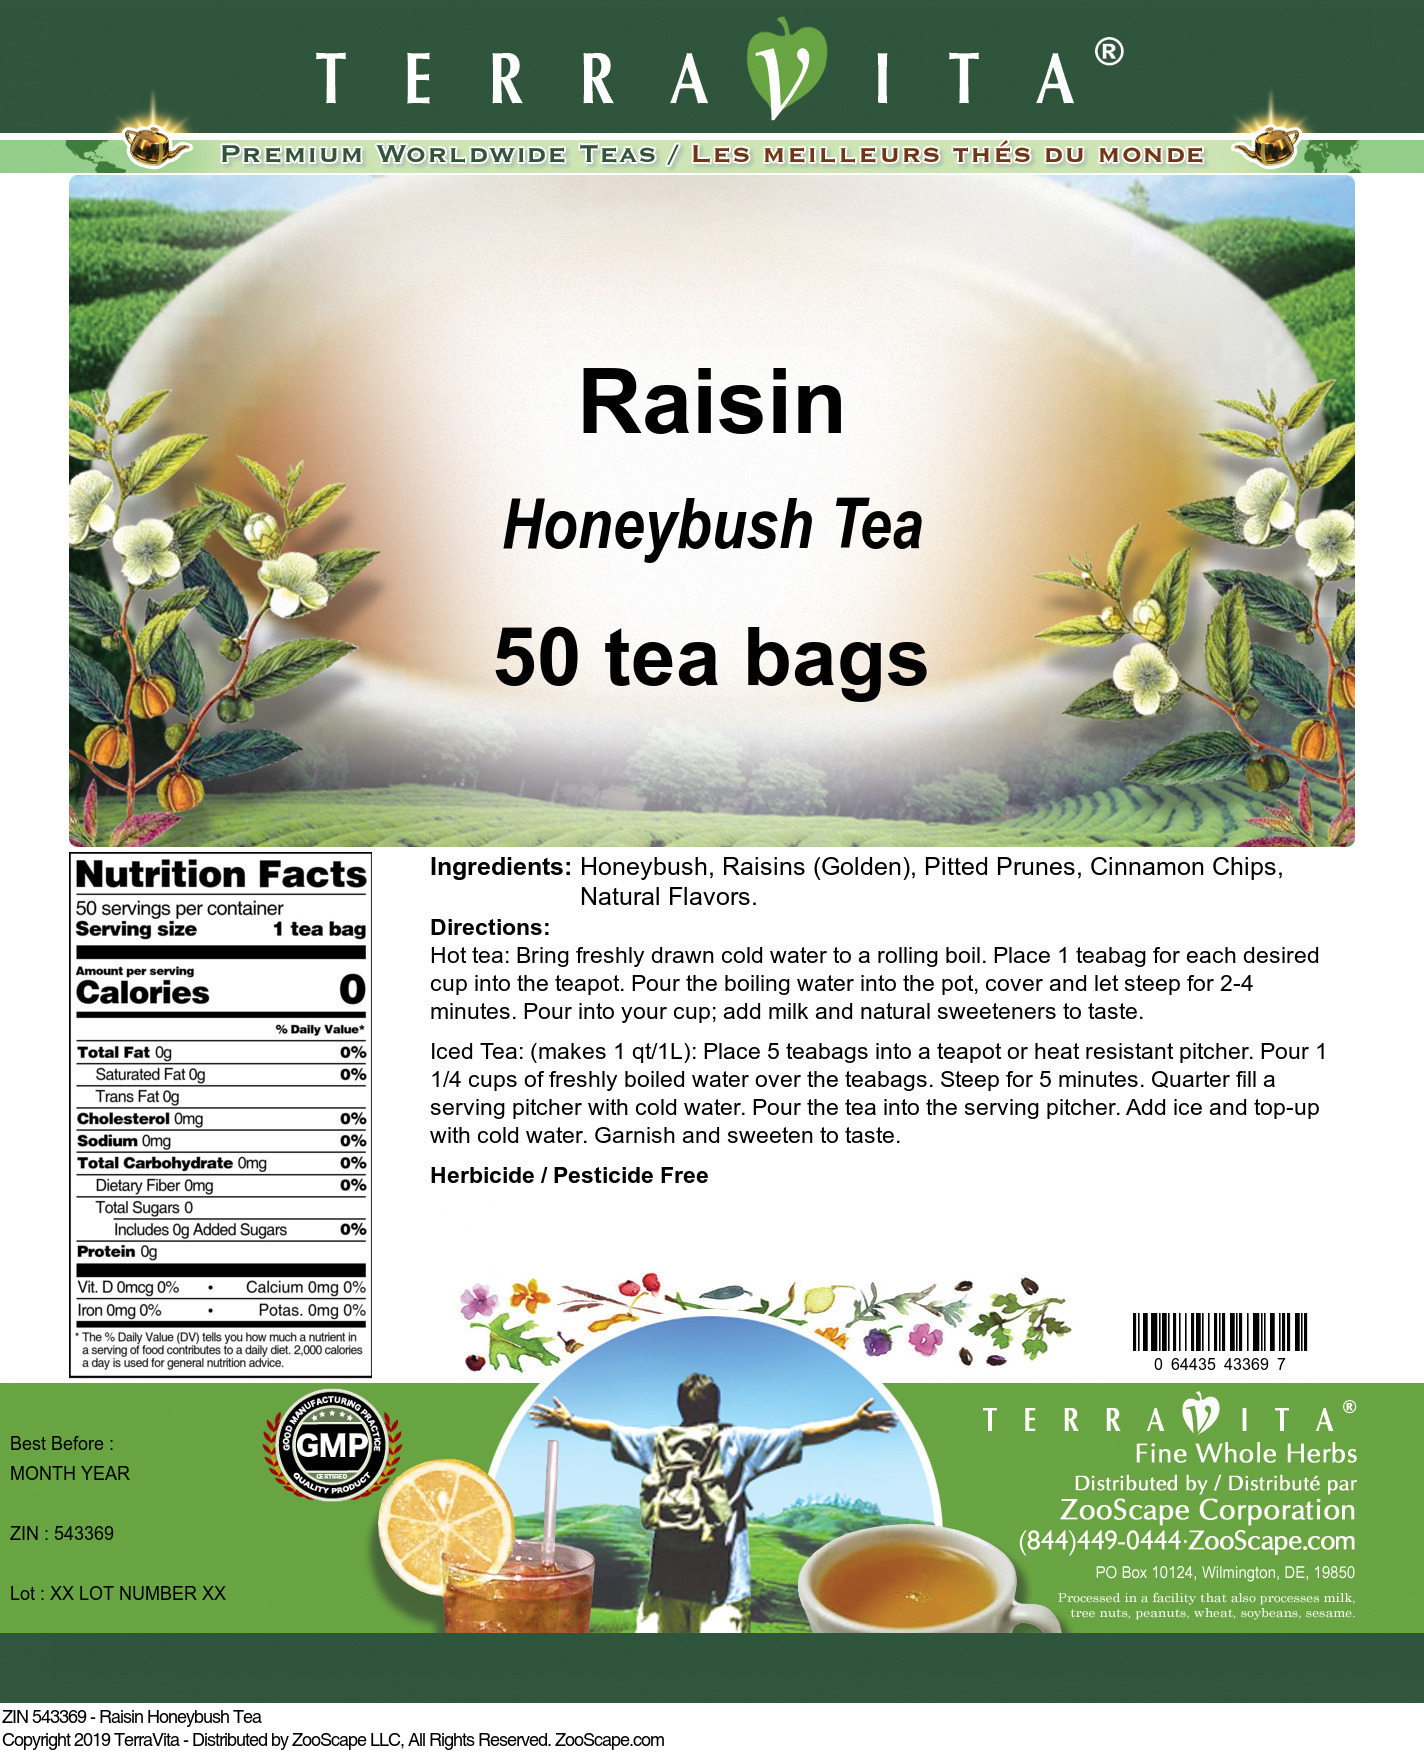 Raisin Honeybush Tea